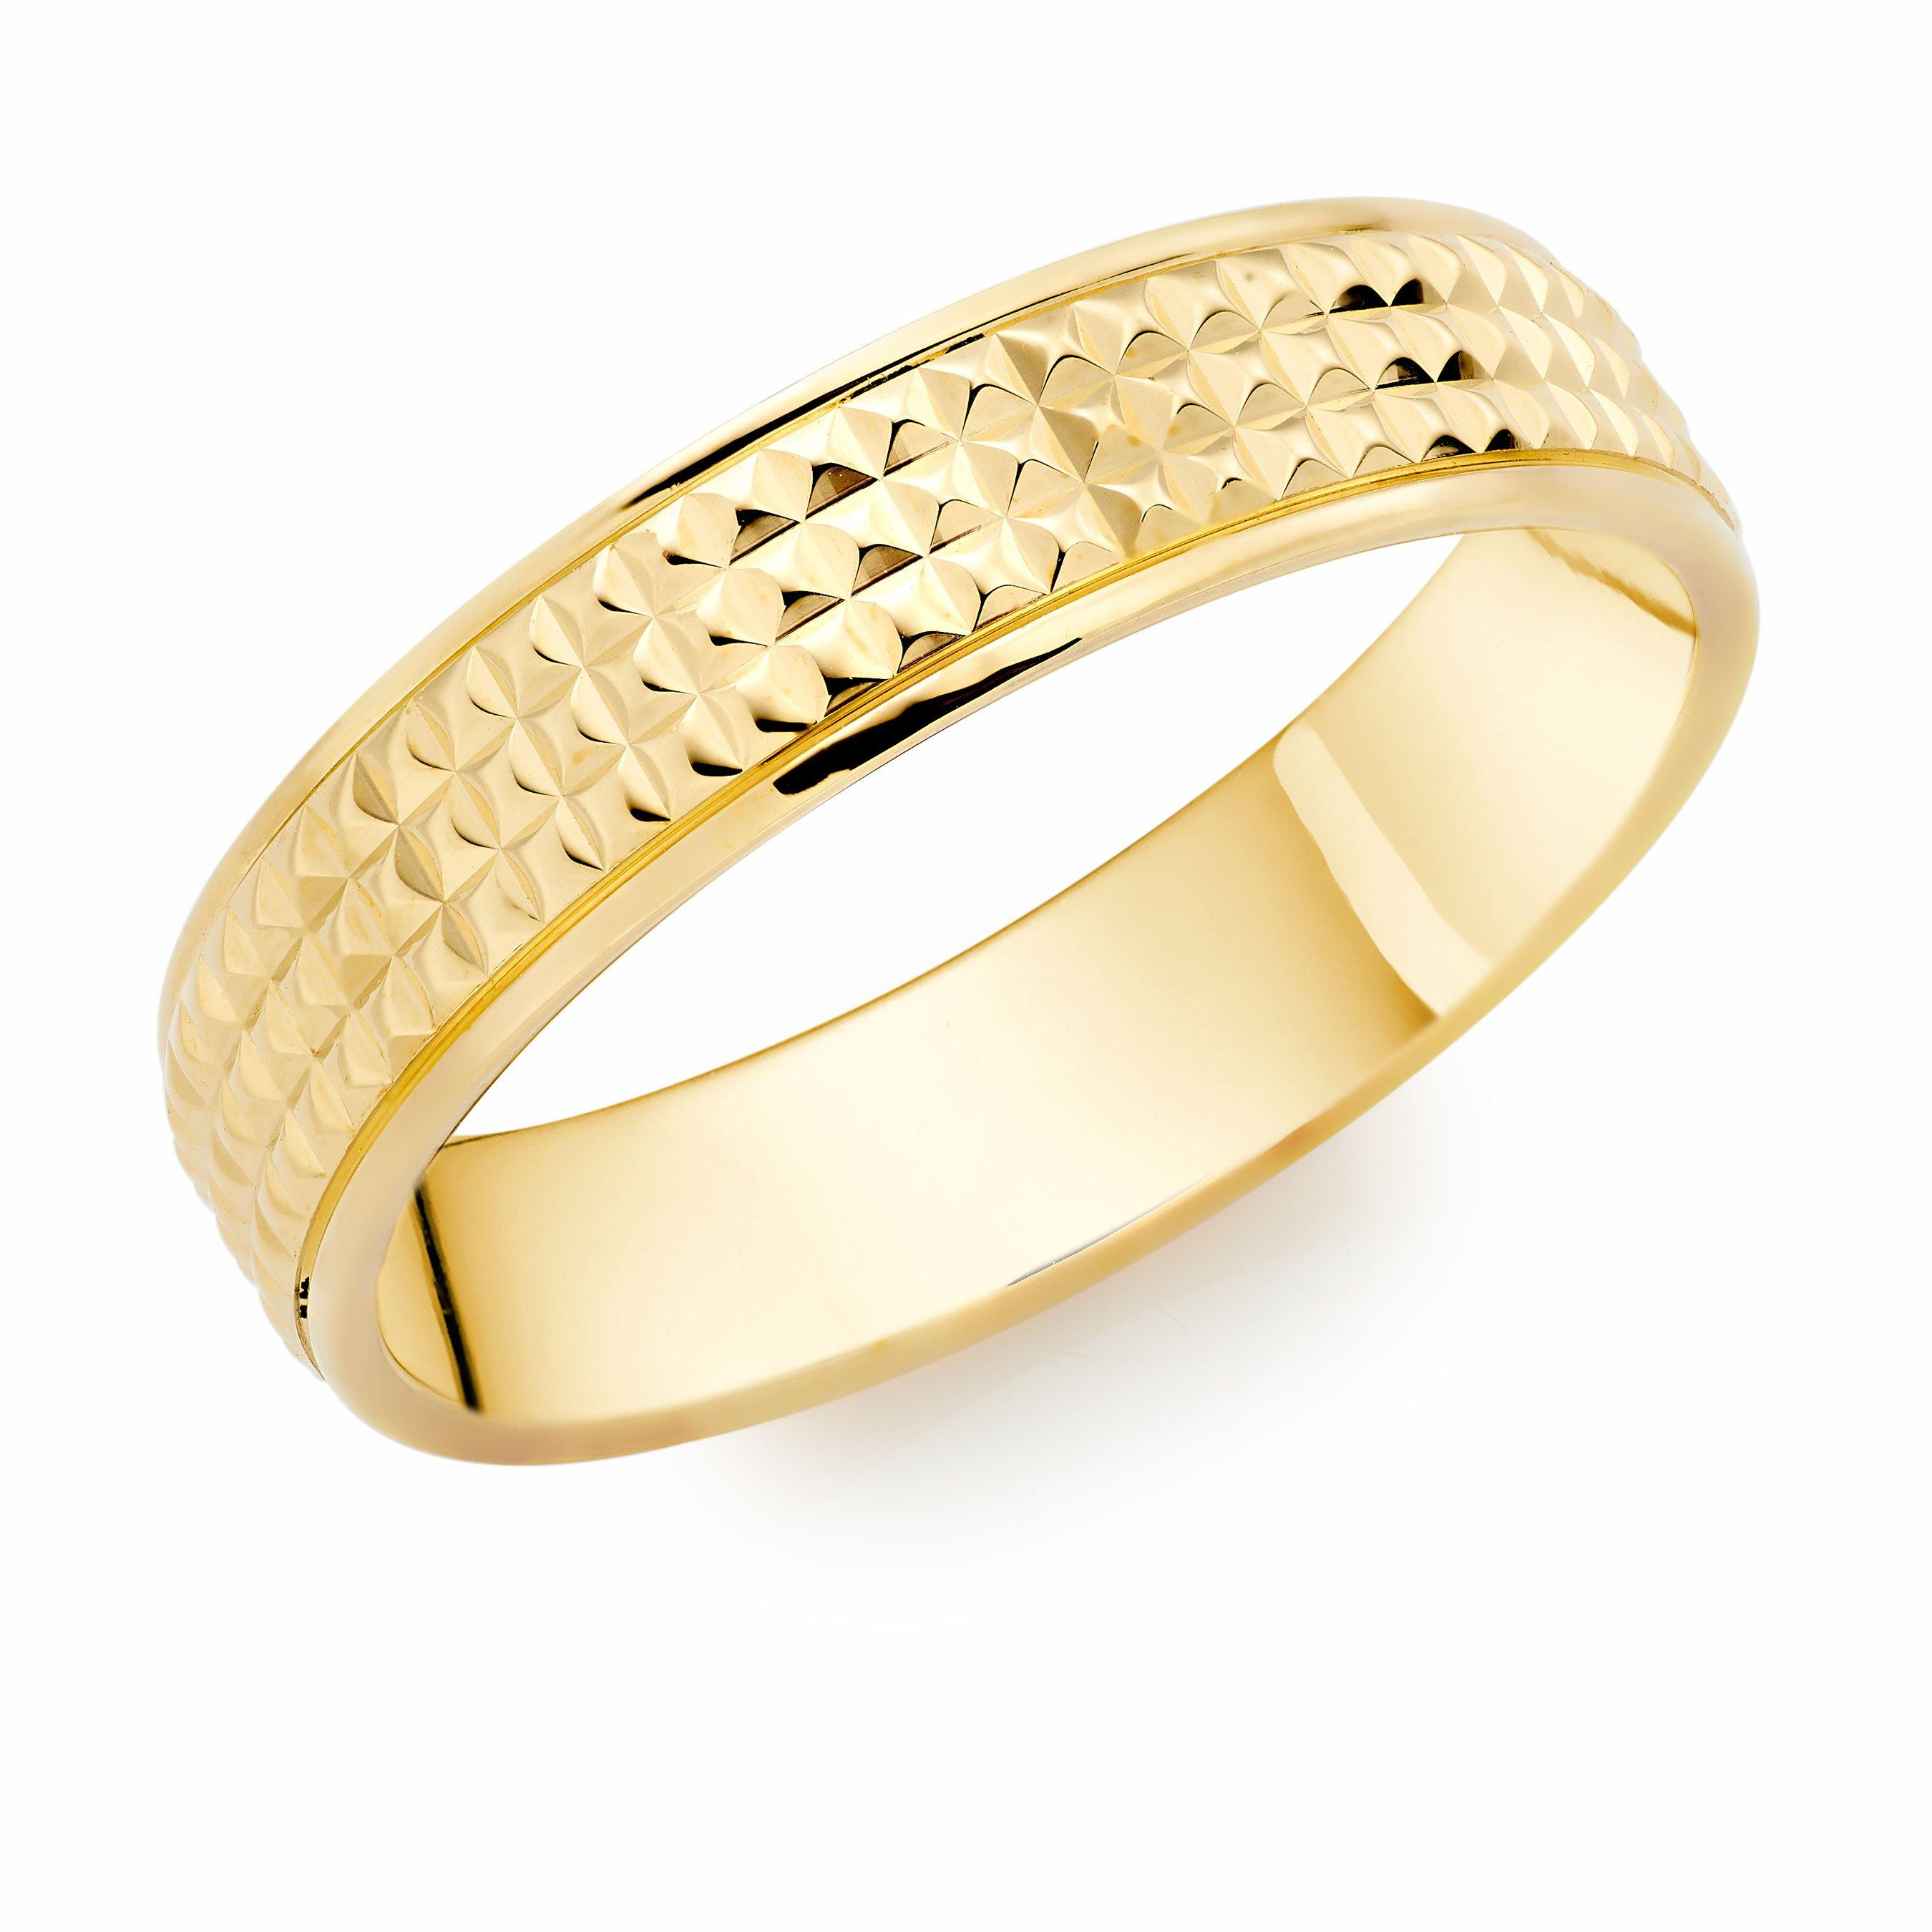 9ct Gold Fancy Men's Wedding Ring